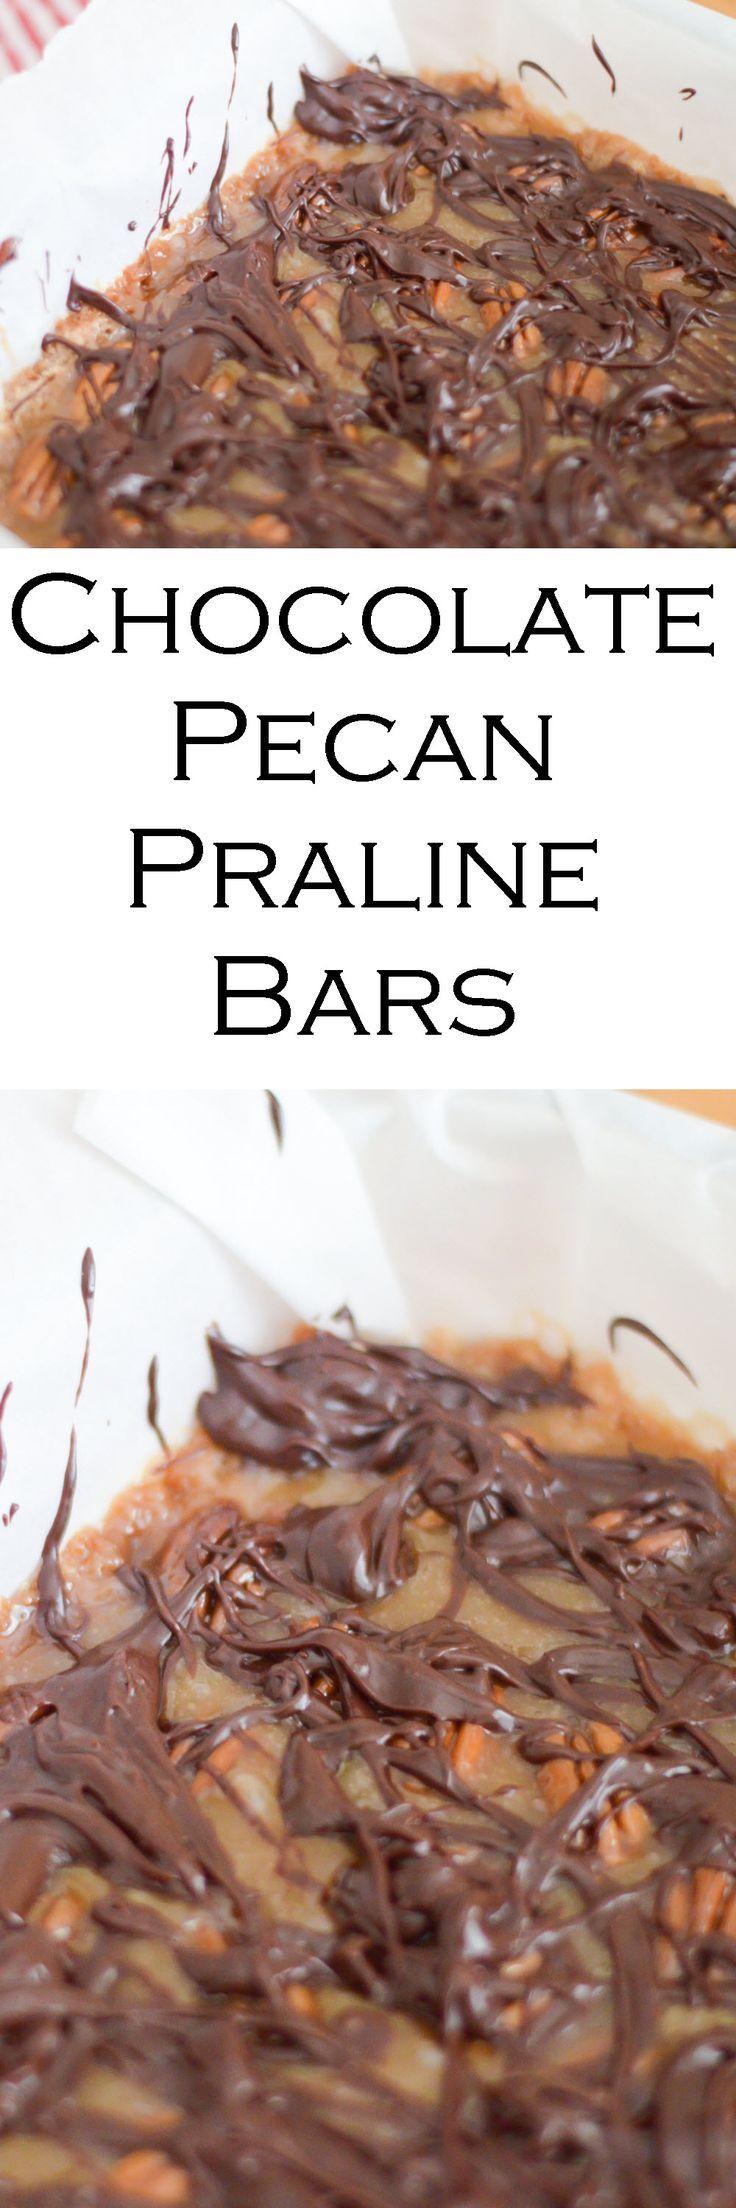 Chocolate Pecan Praline Bars - Classic Southern Dessert